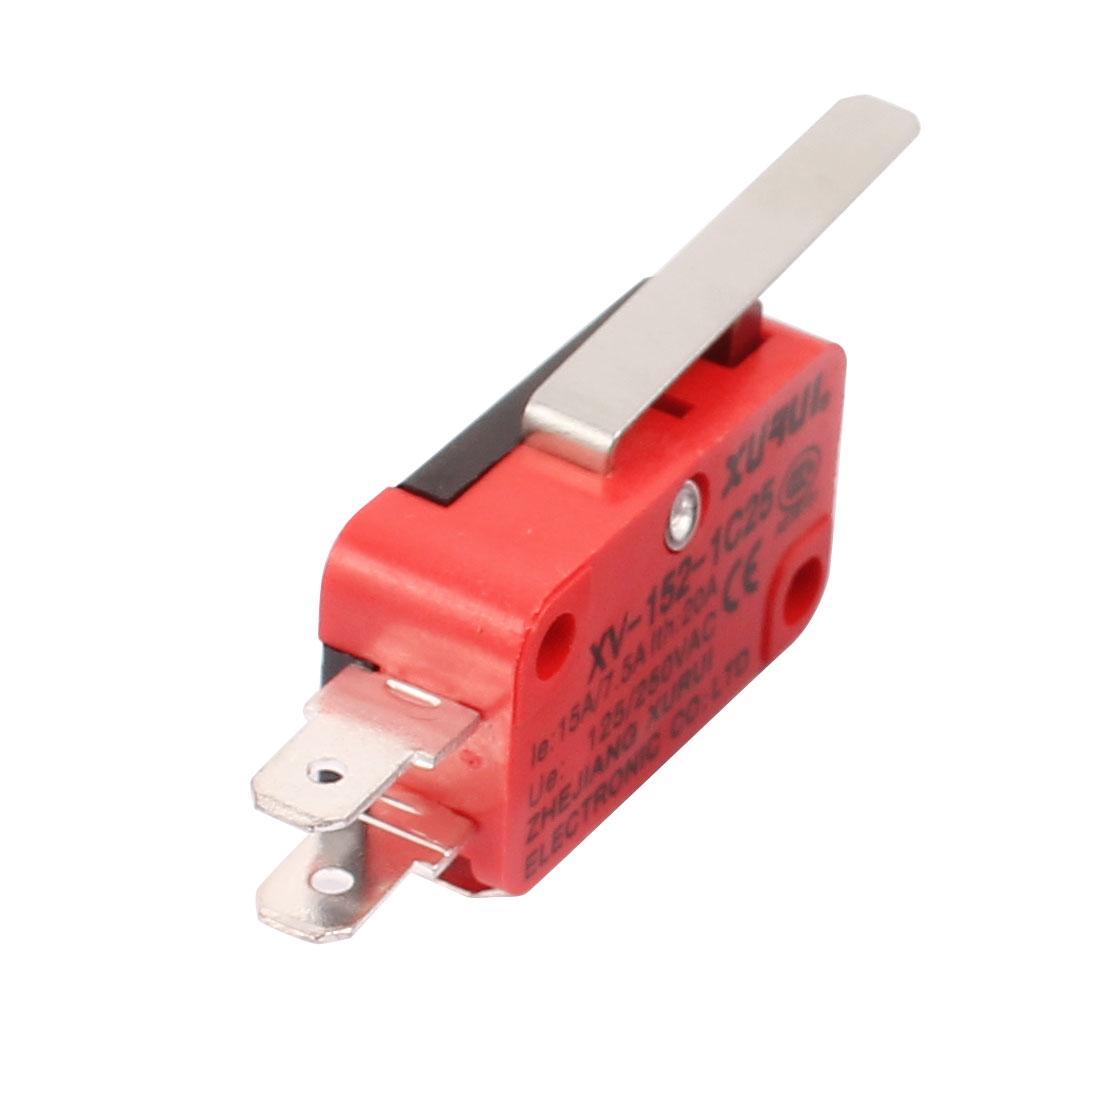 XV-152-1C25 Hinge Lever Type Miniature Micro Switch Momentary